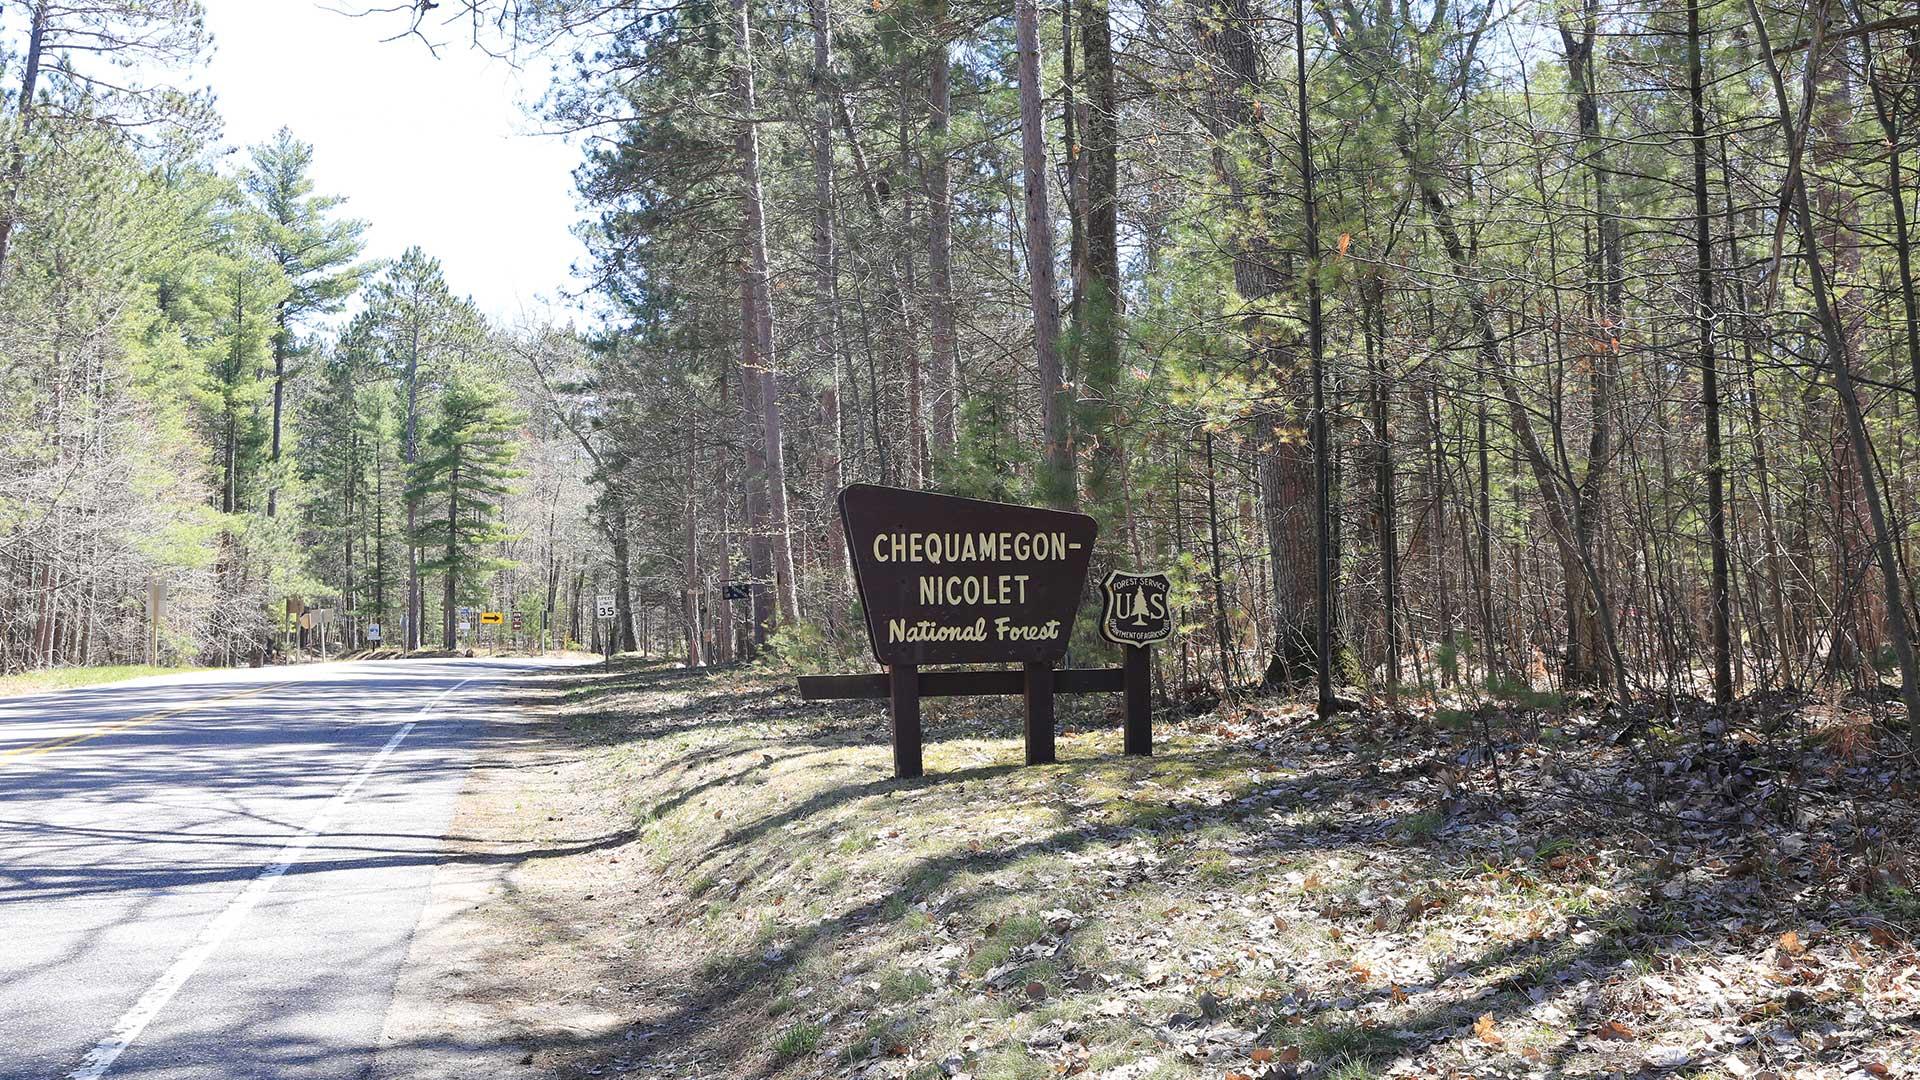 Chequamegon-Nicolet National Forest entrance